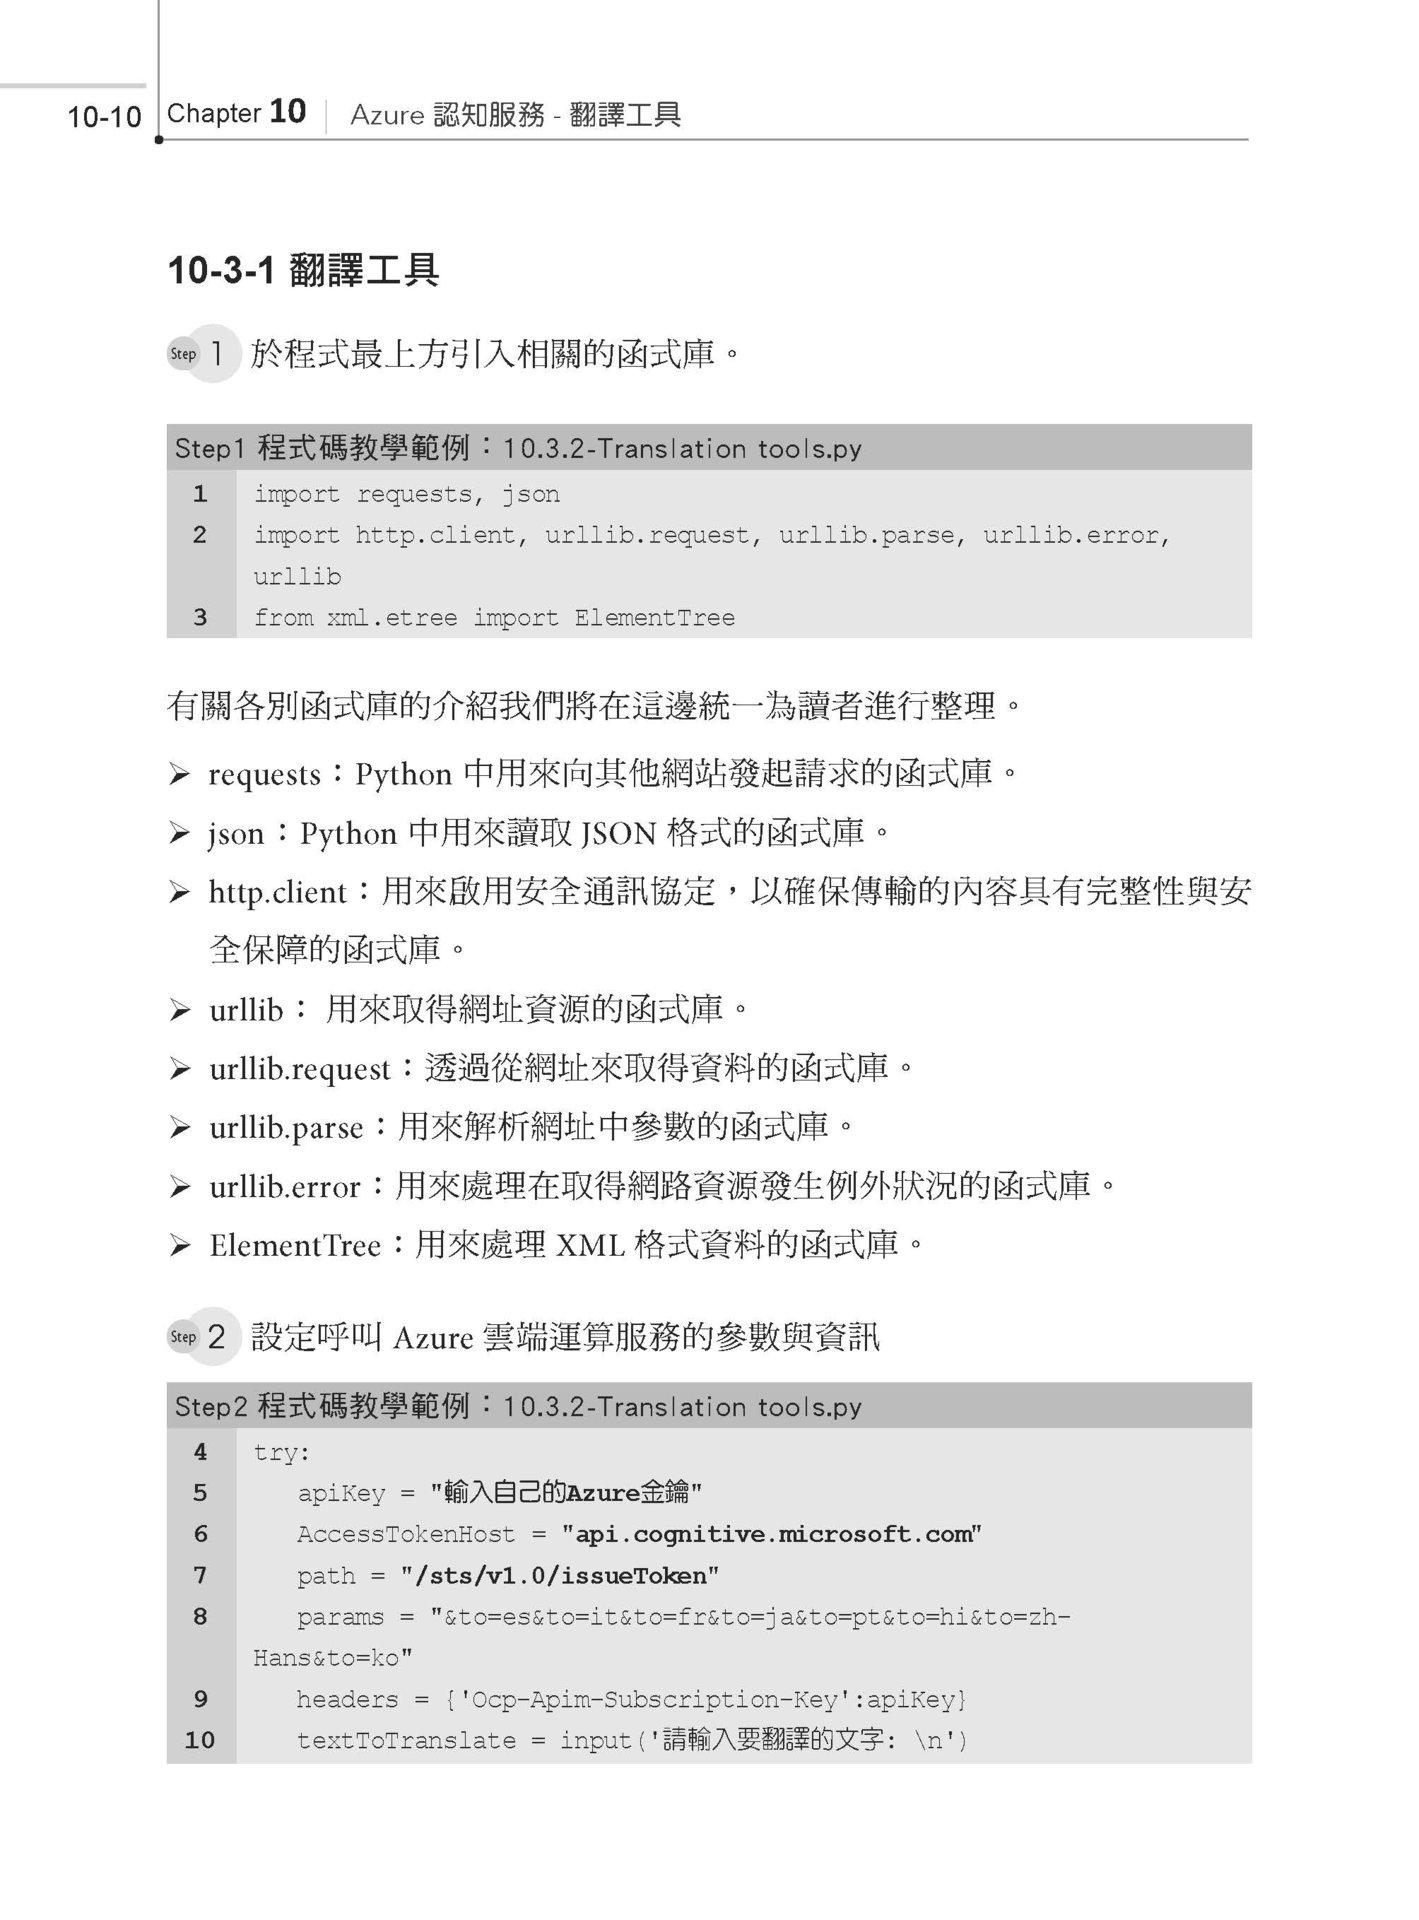 Python 人工智慧程式設計入門:使用 Microsoft Azure 雲端服務-preview-7